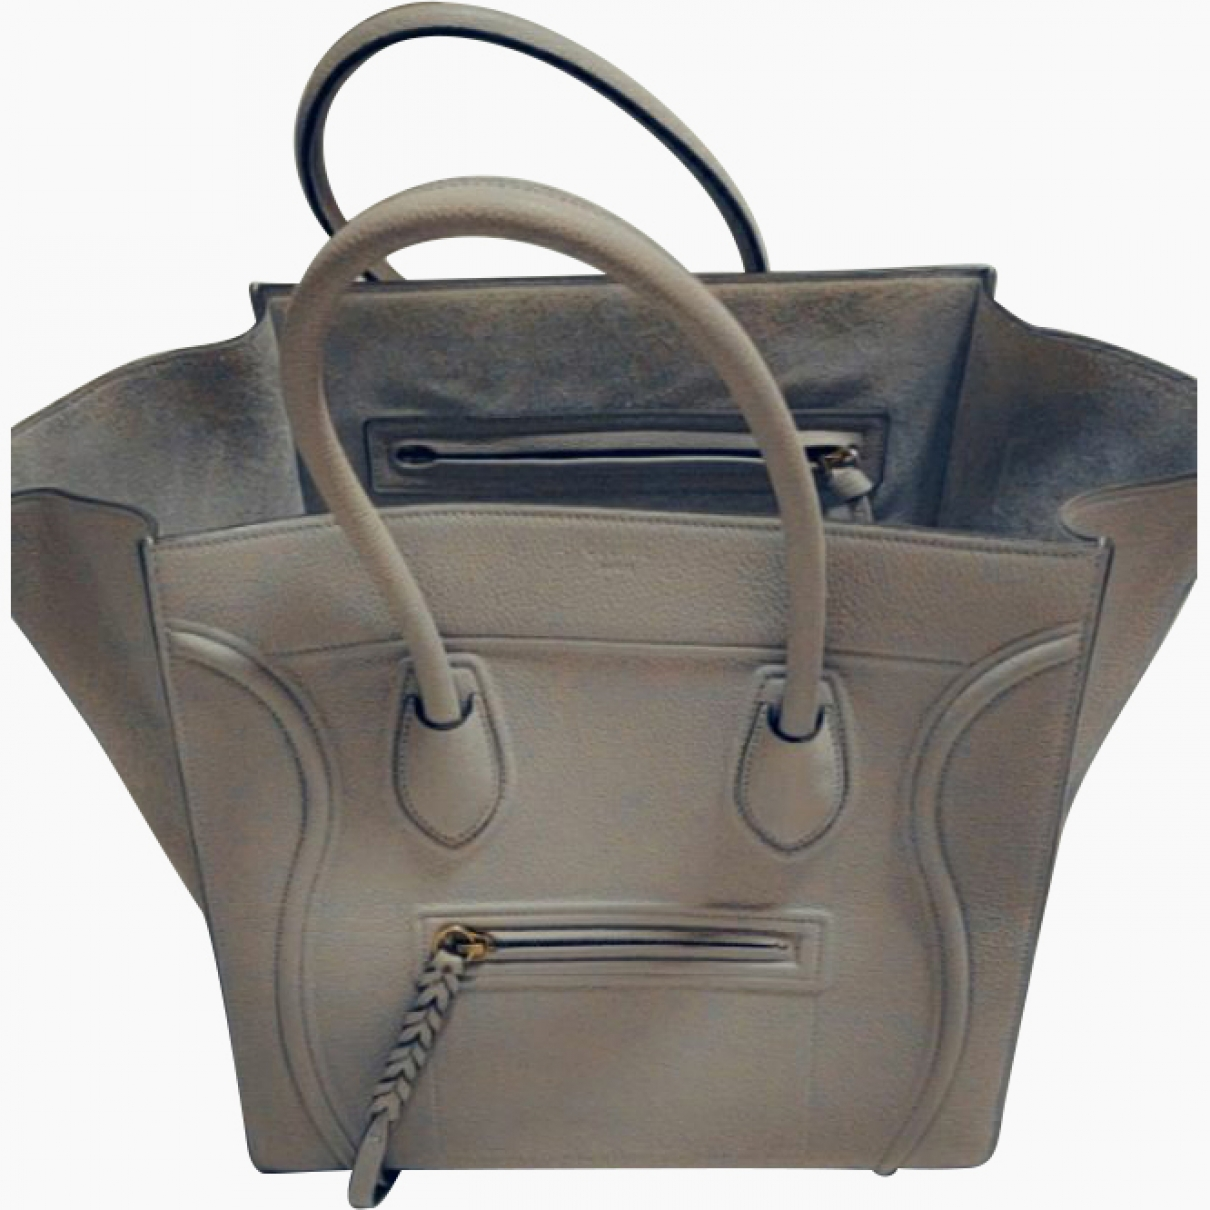 Celine Luggage Phantom Grey Leather handbag for Women \N